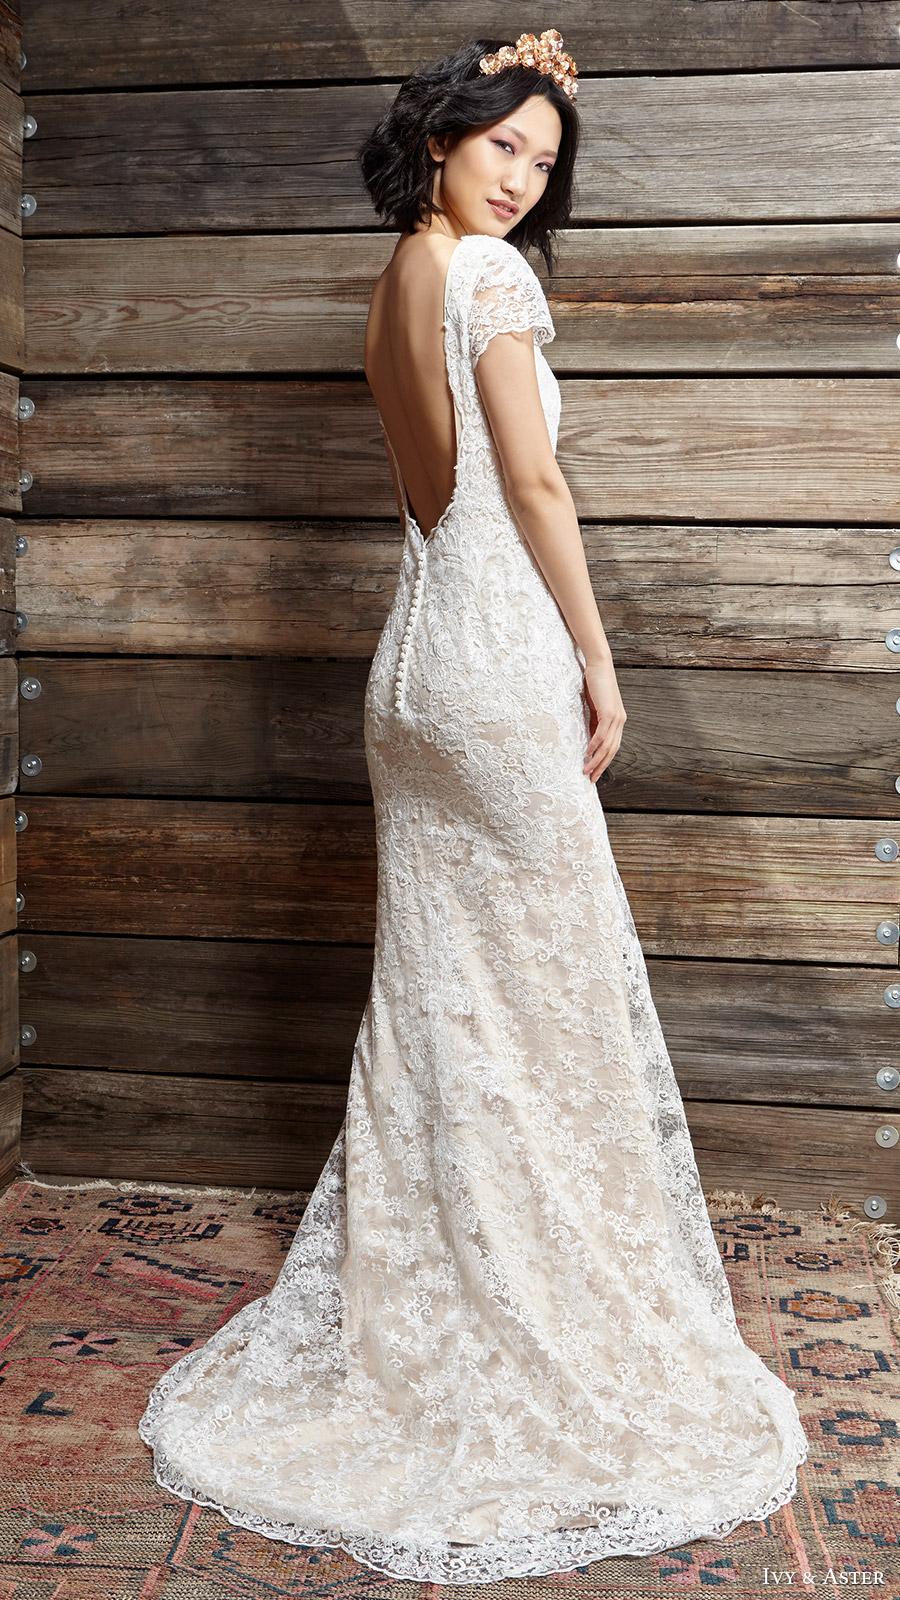 ivy aster bridal spring 2017 cap sleeves jewel neck lace wedding dress (sylvia) sv scoop back